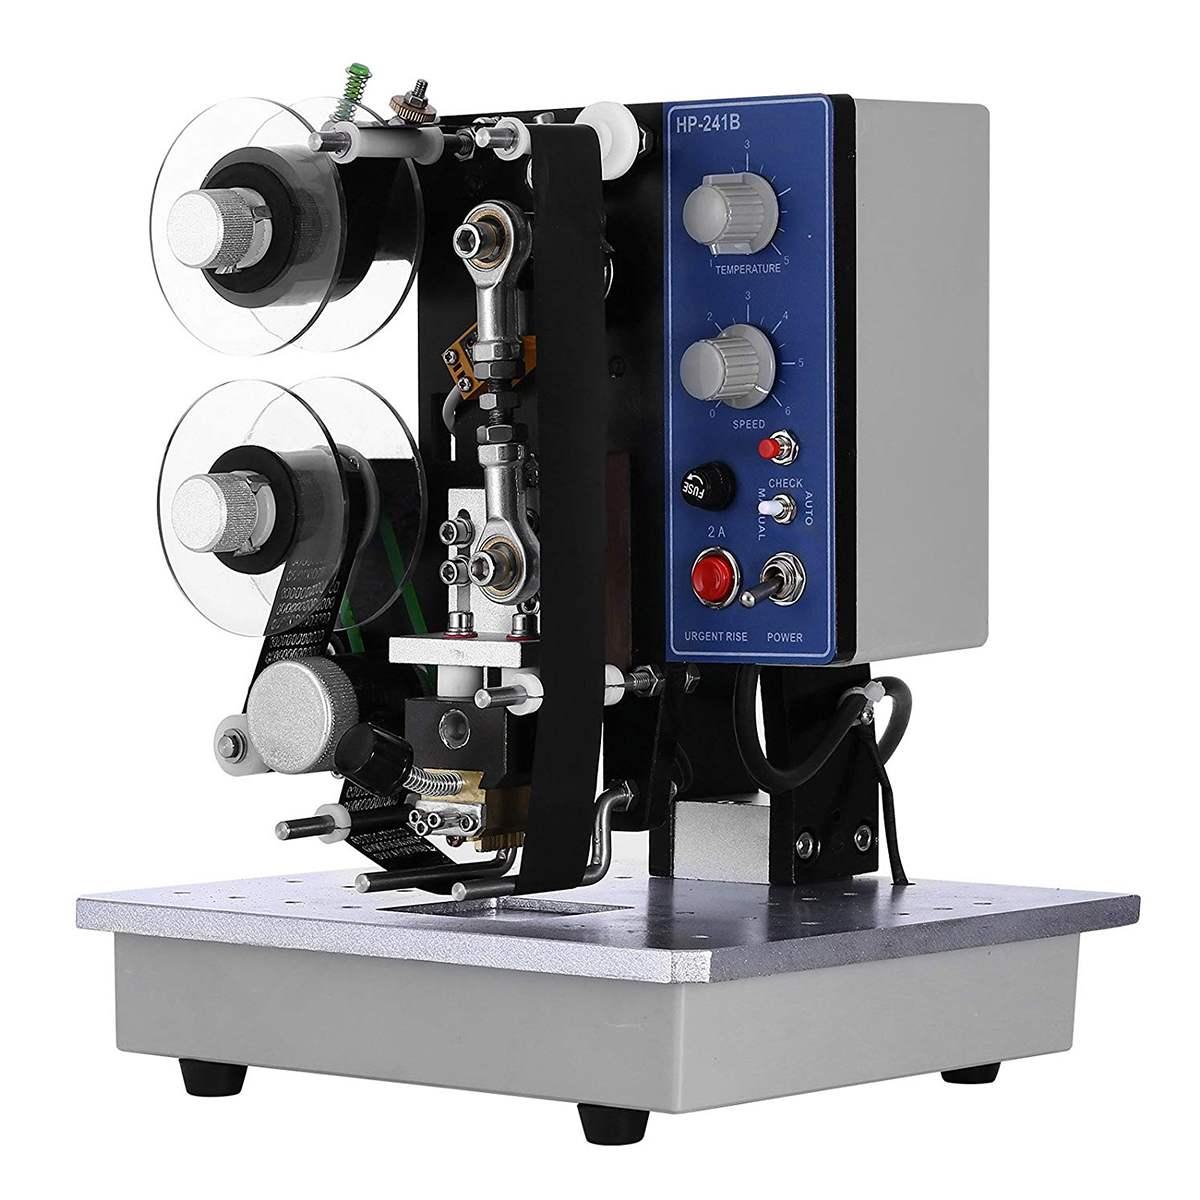 for HP 241B Electric Hot Printing Machine Ribbon Stamping Machine Date Coding Machine Printing Machine